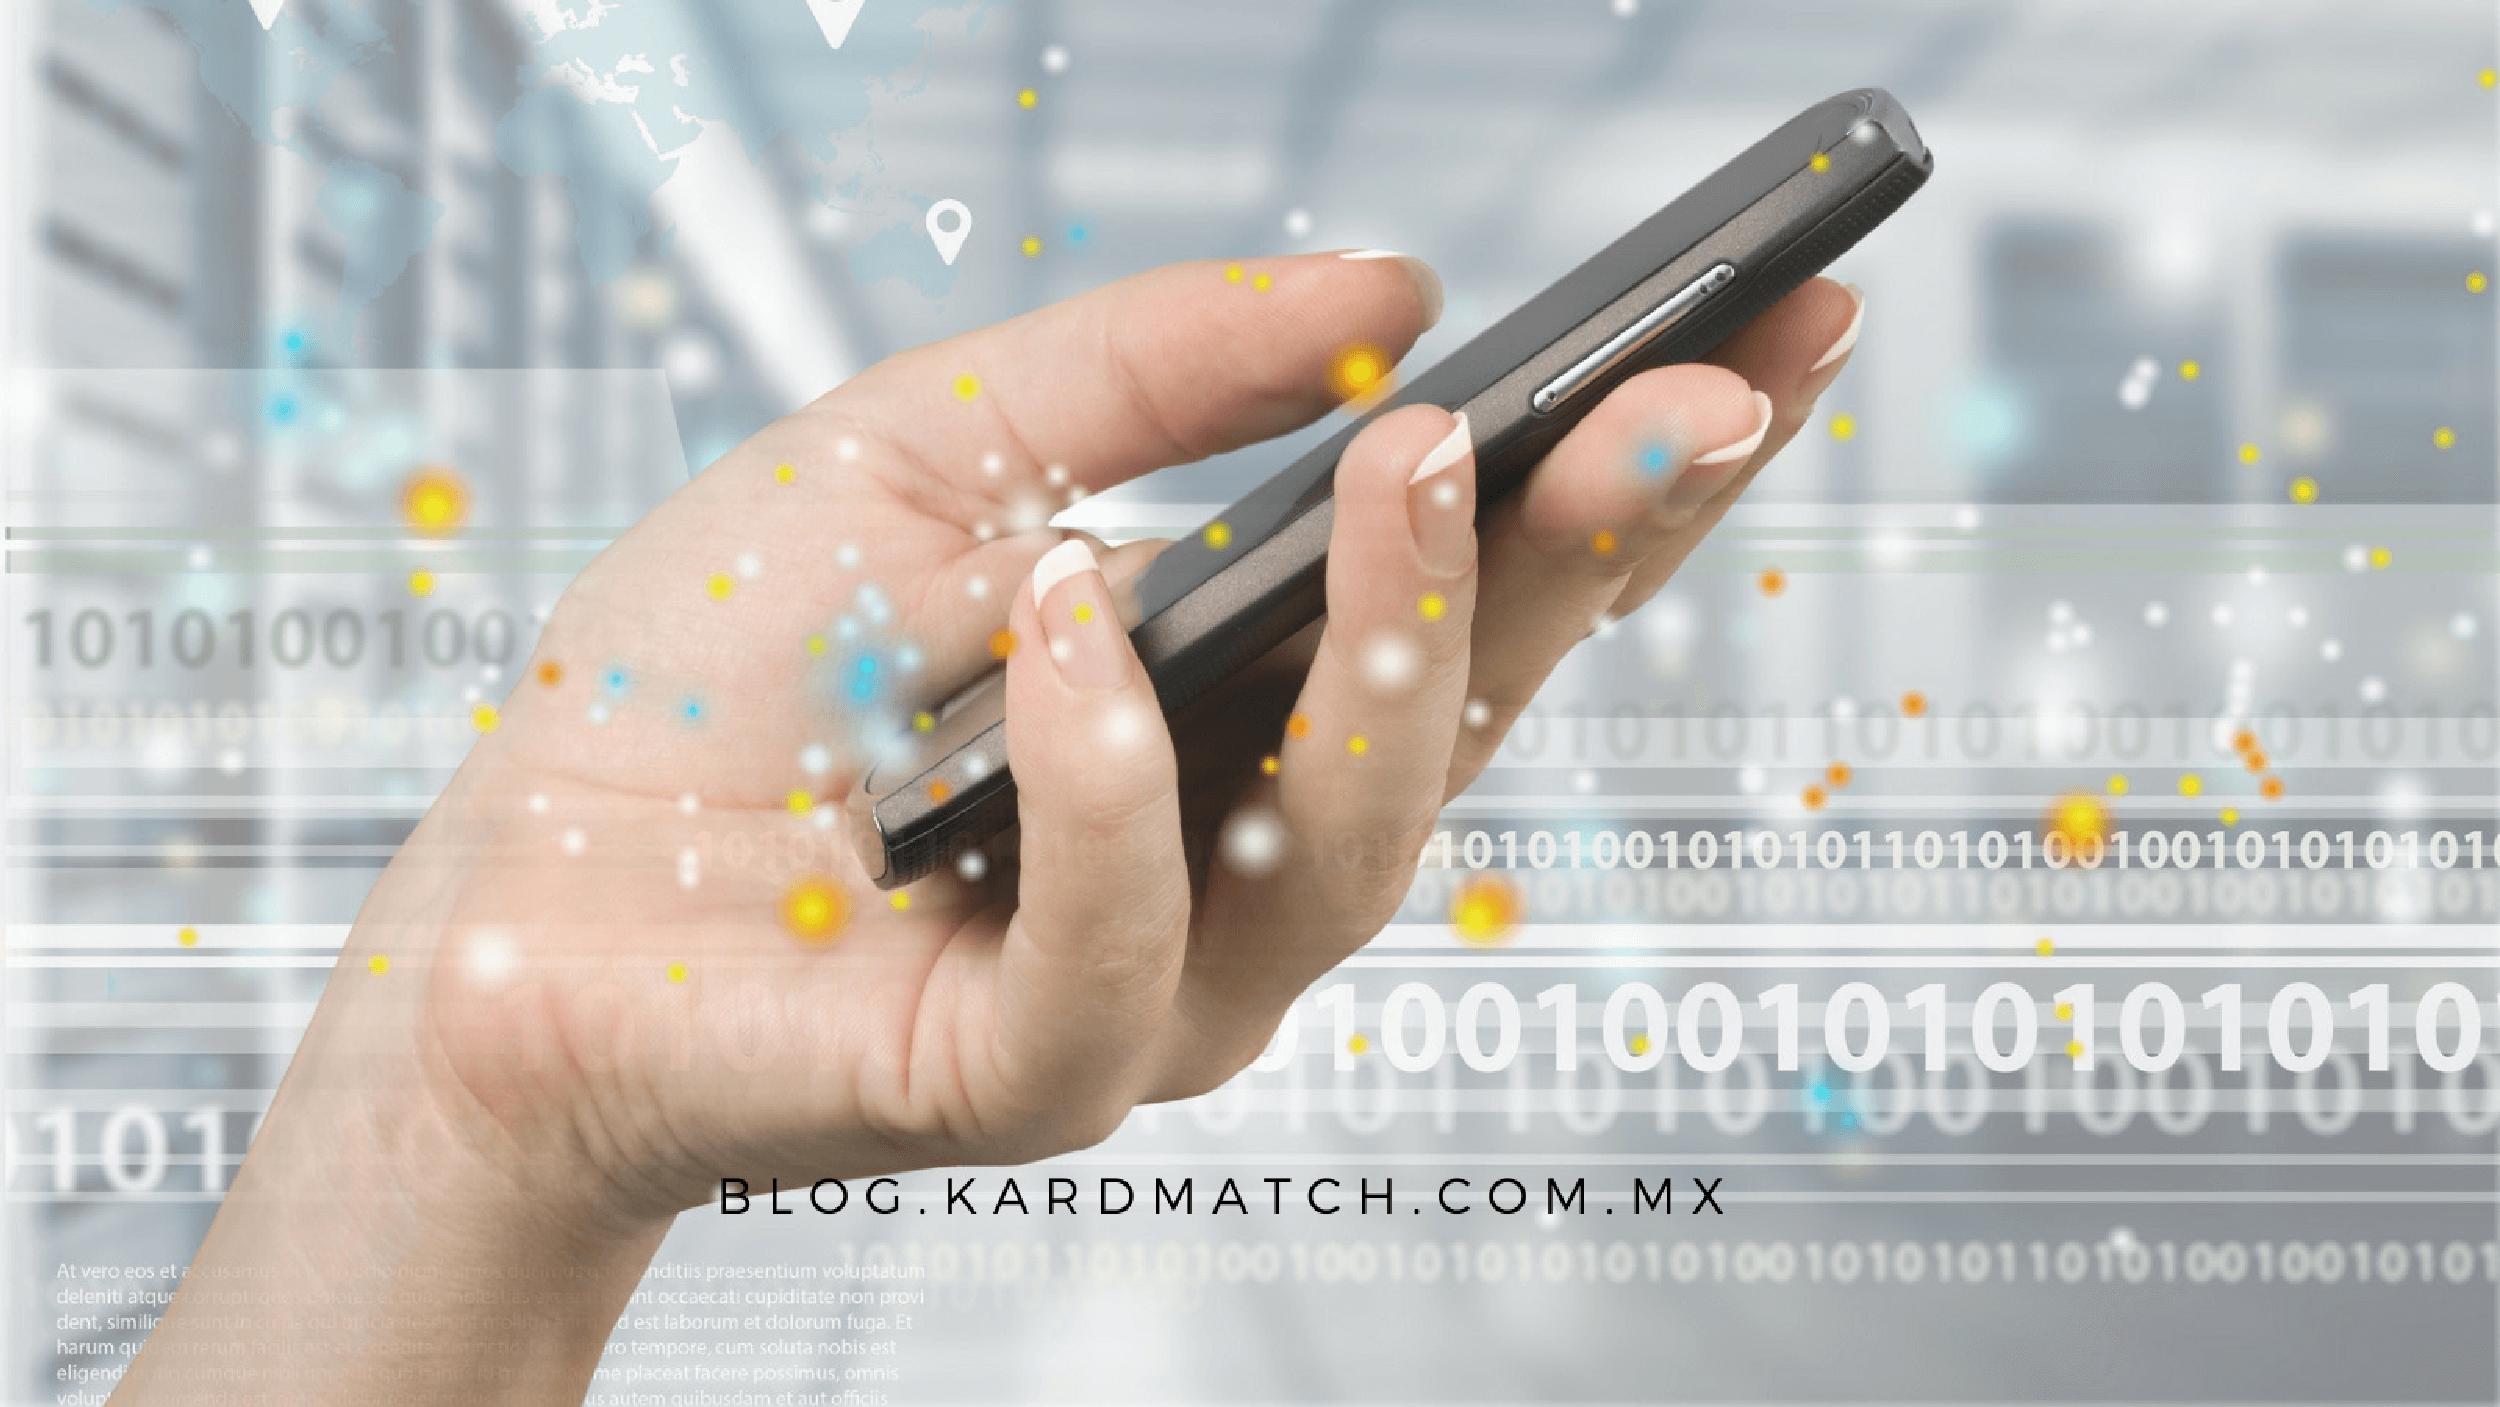 liverpool-celulares.png